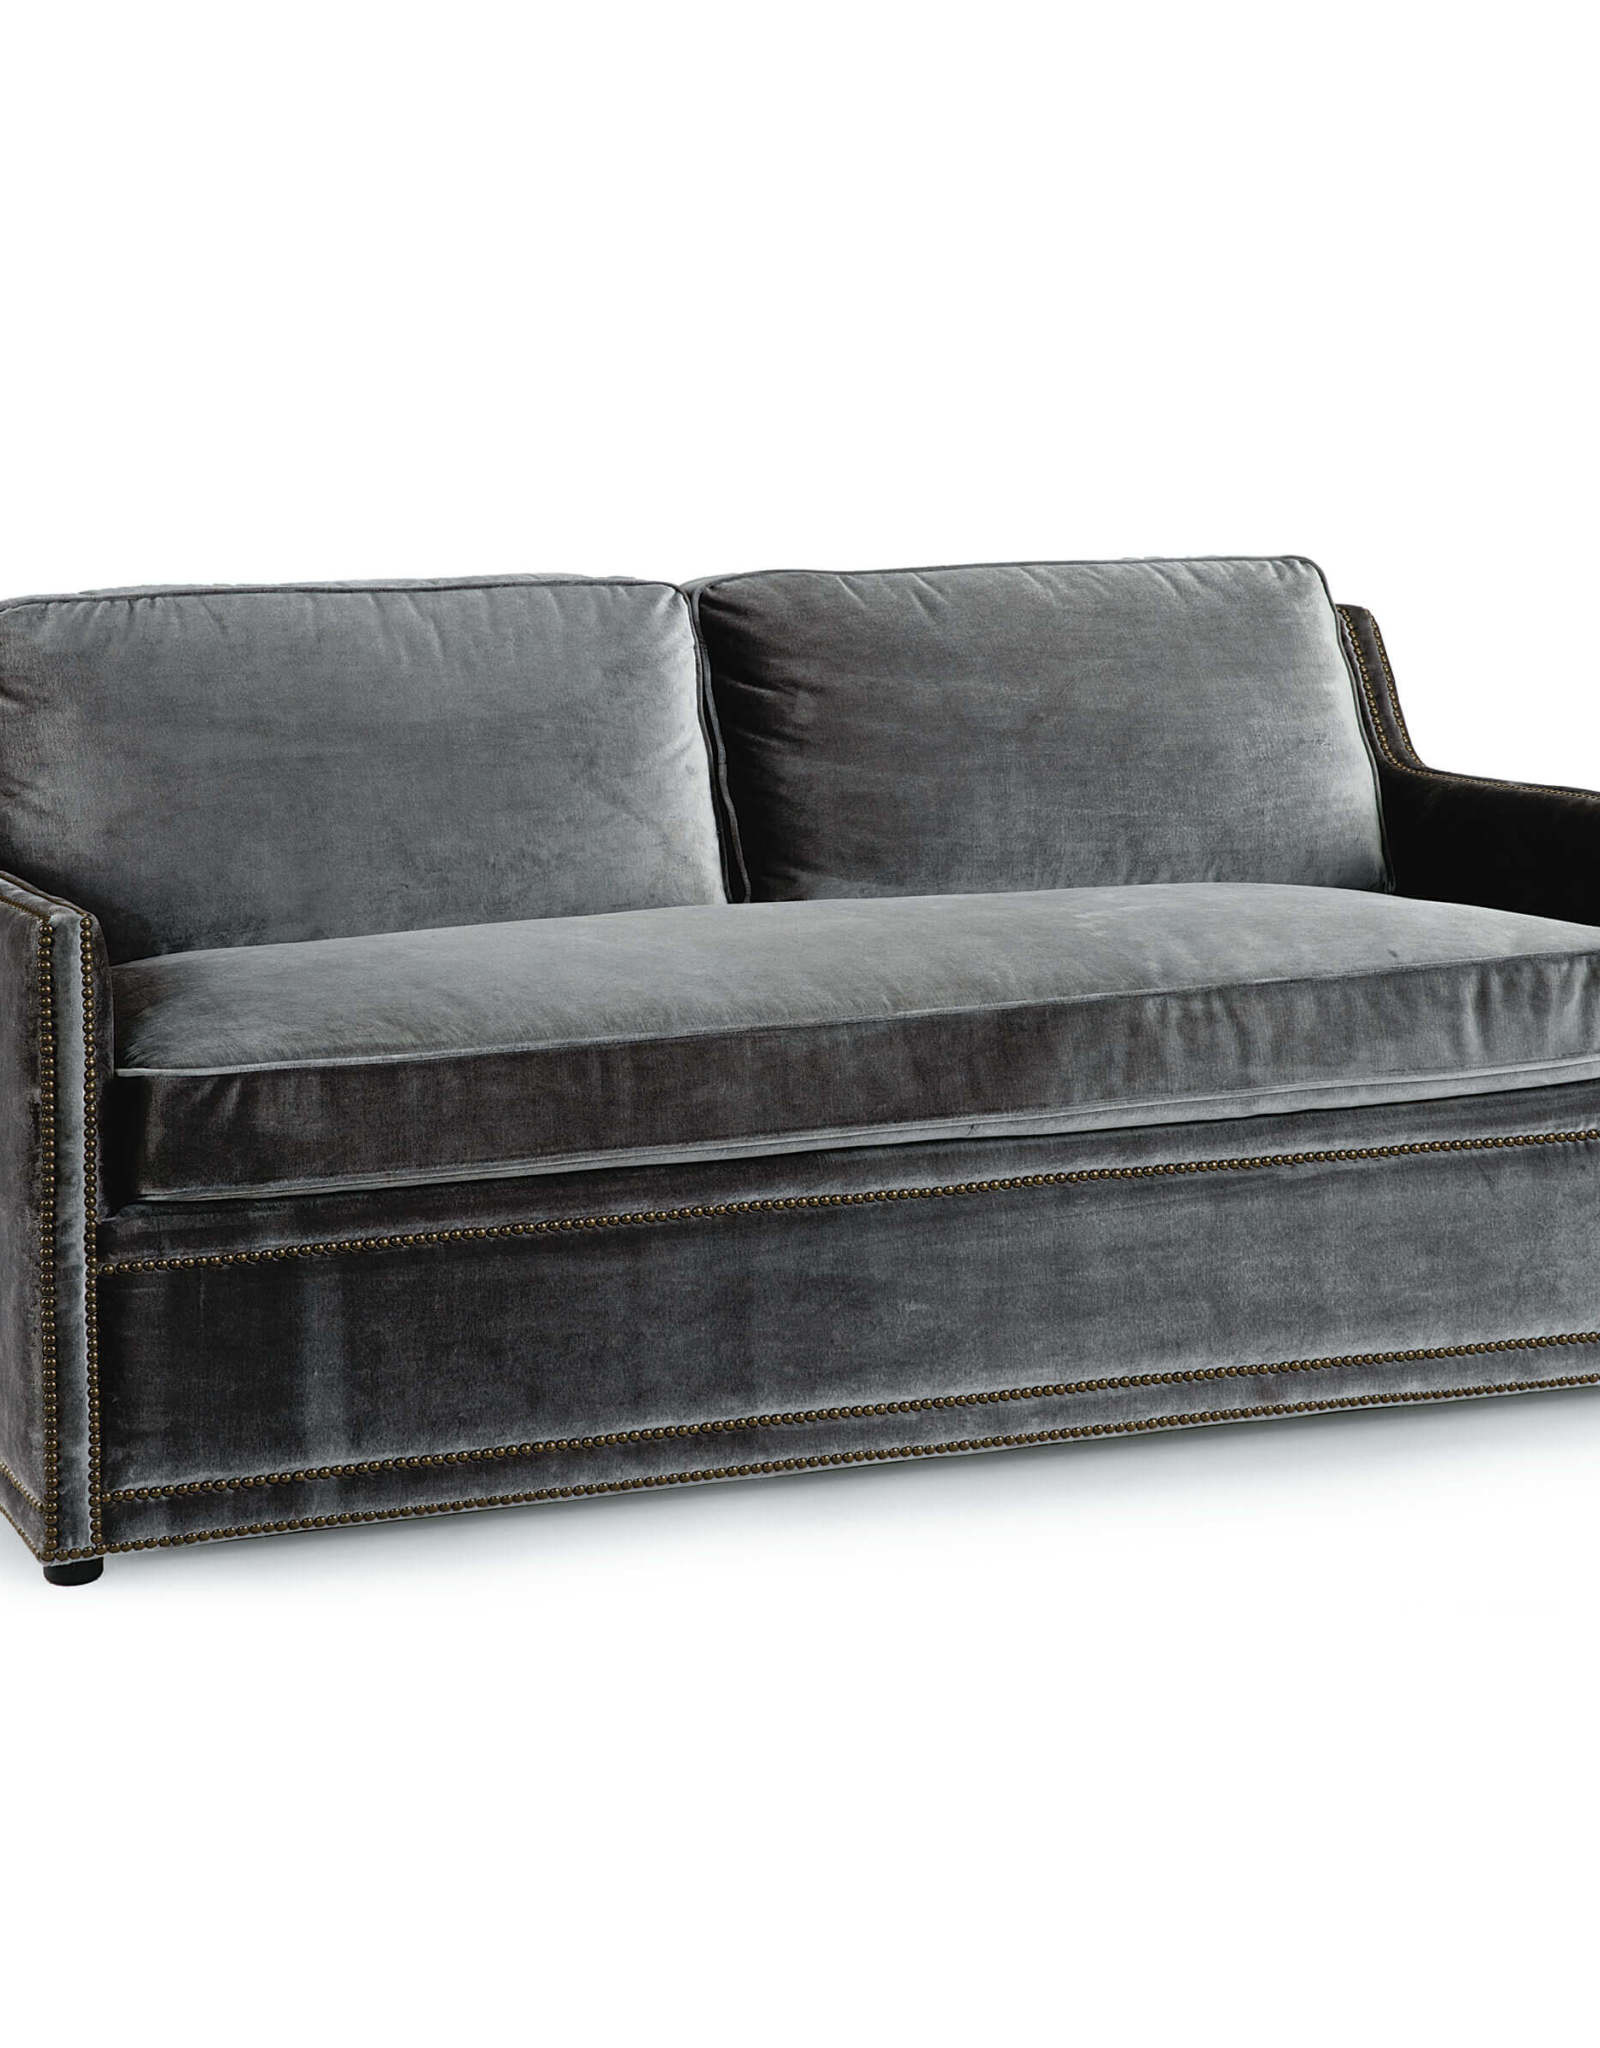 Regina Andrew Design Posh Sofa (Charcoal Grey)